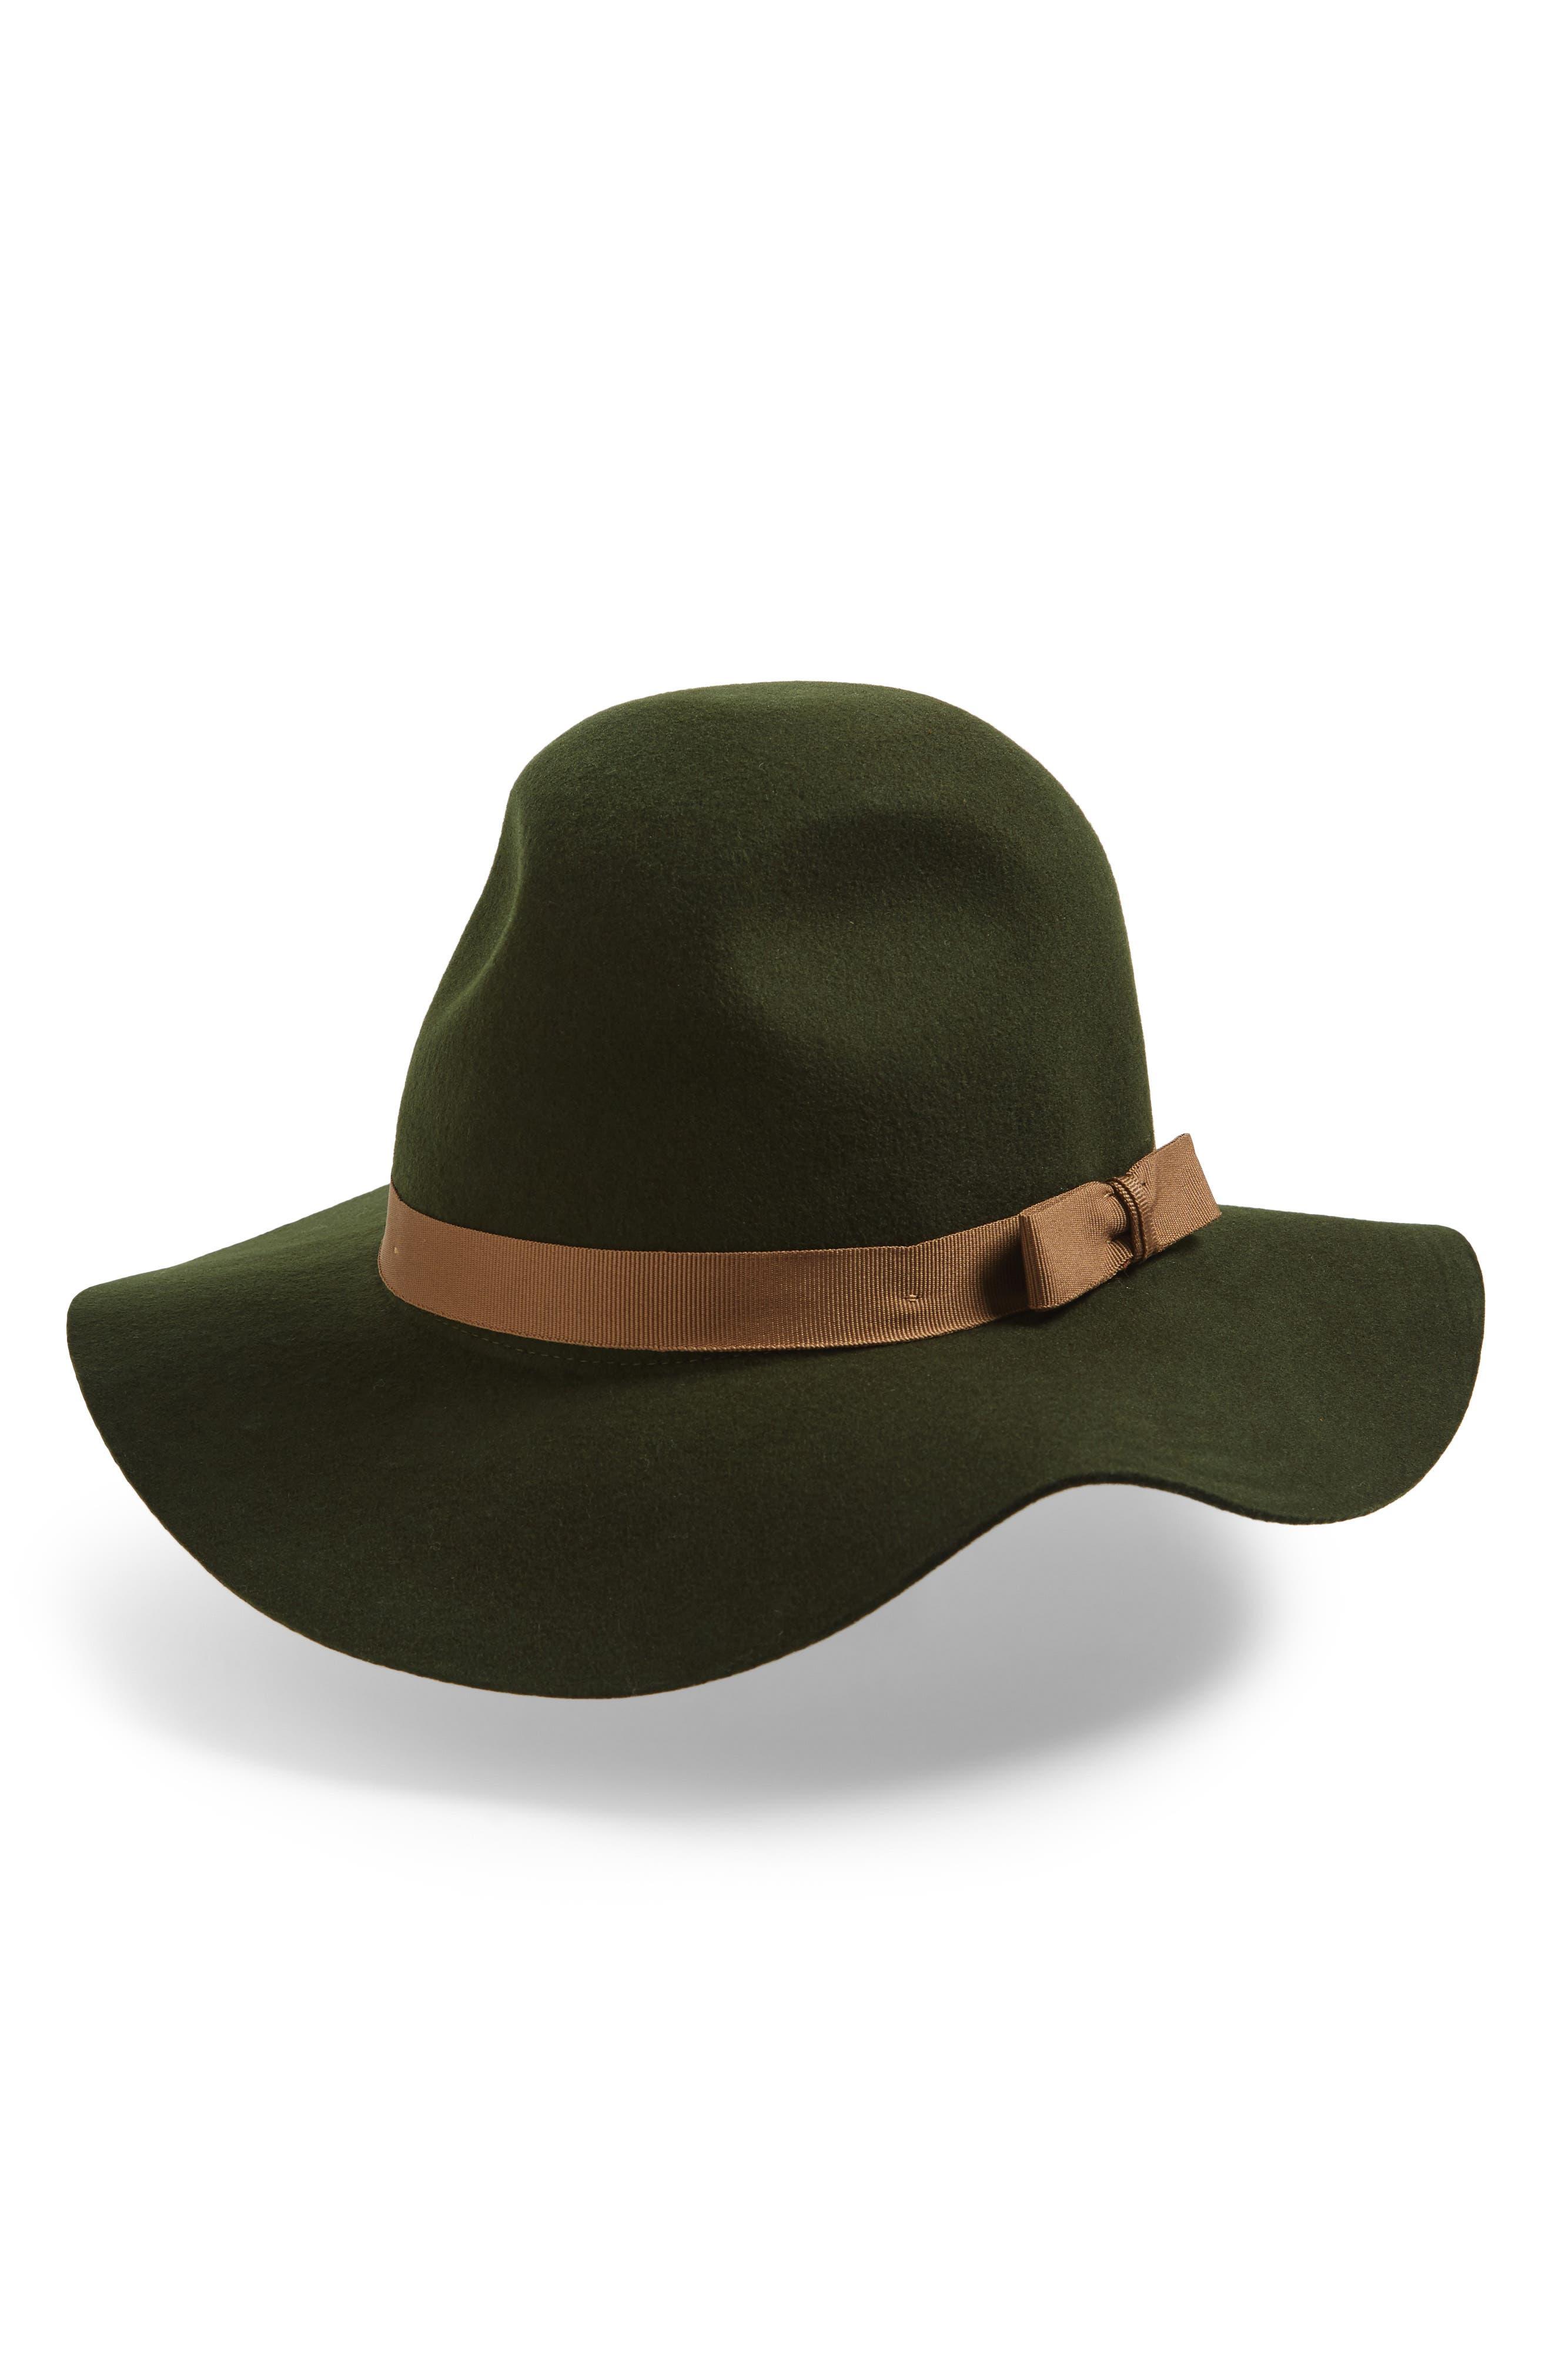 'Dalila' Floppy Felt Hat,                             Main thumbnail 1, color,